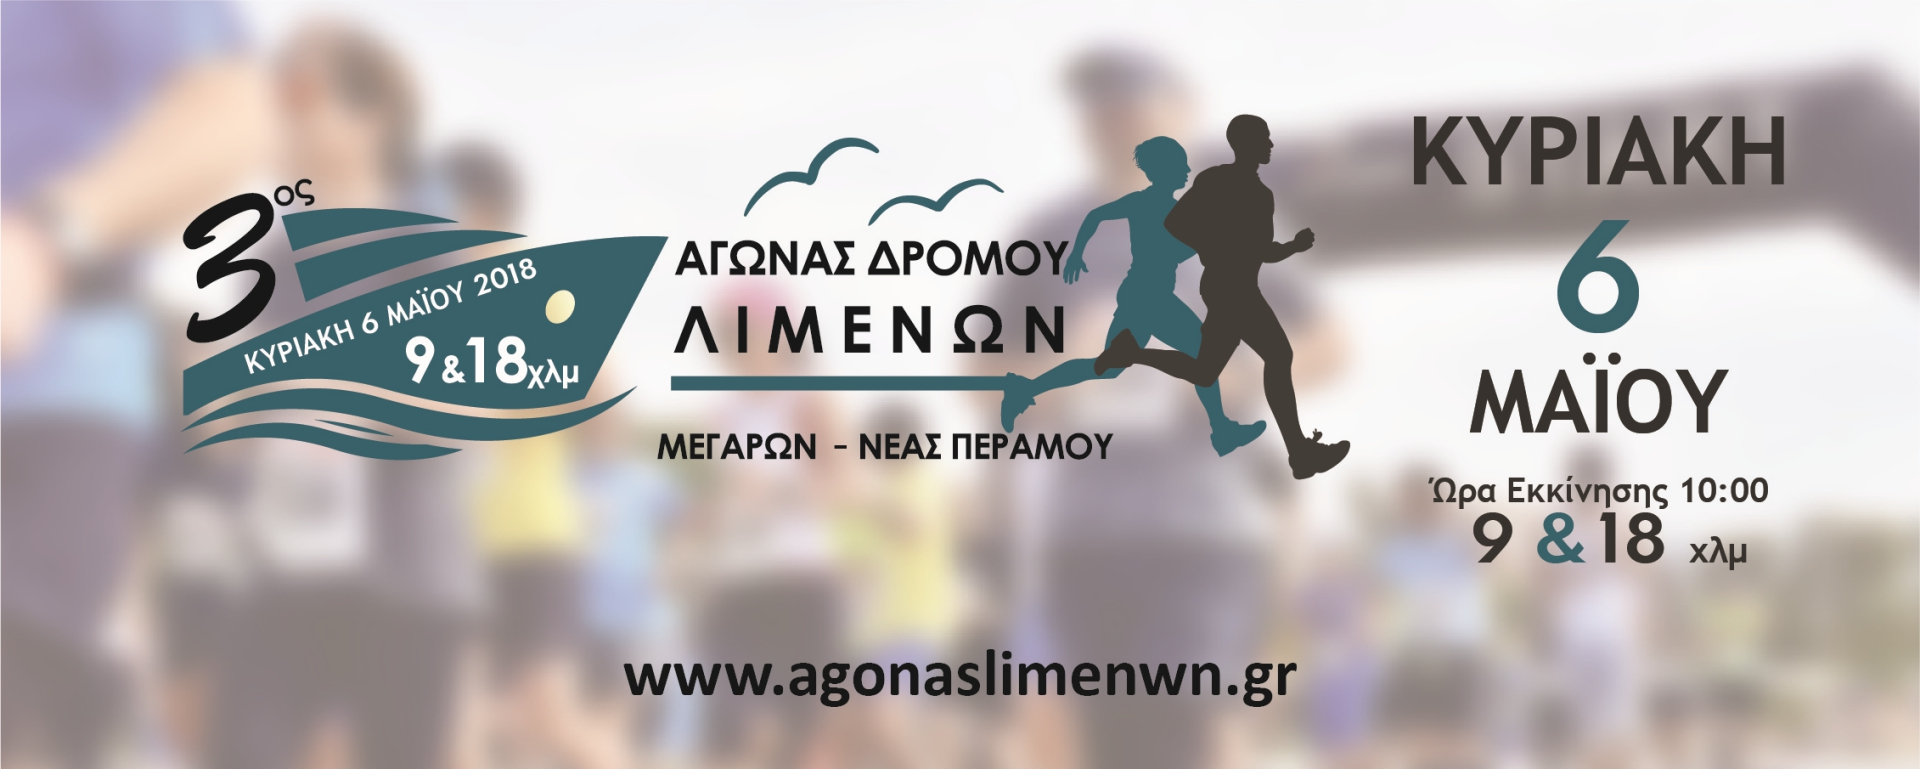 3os-agonas-limenwn-2018-large